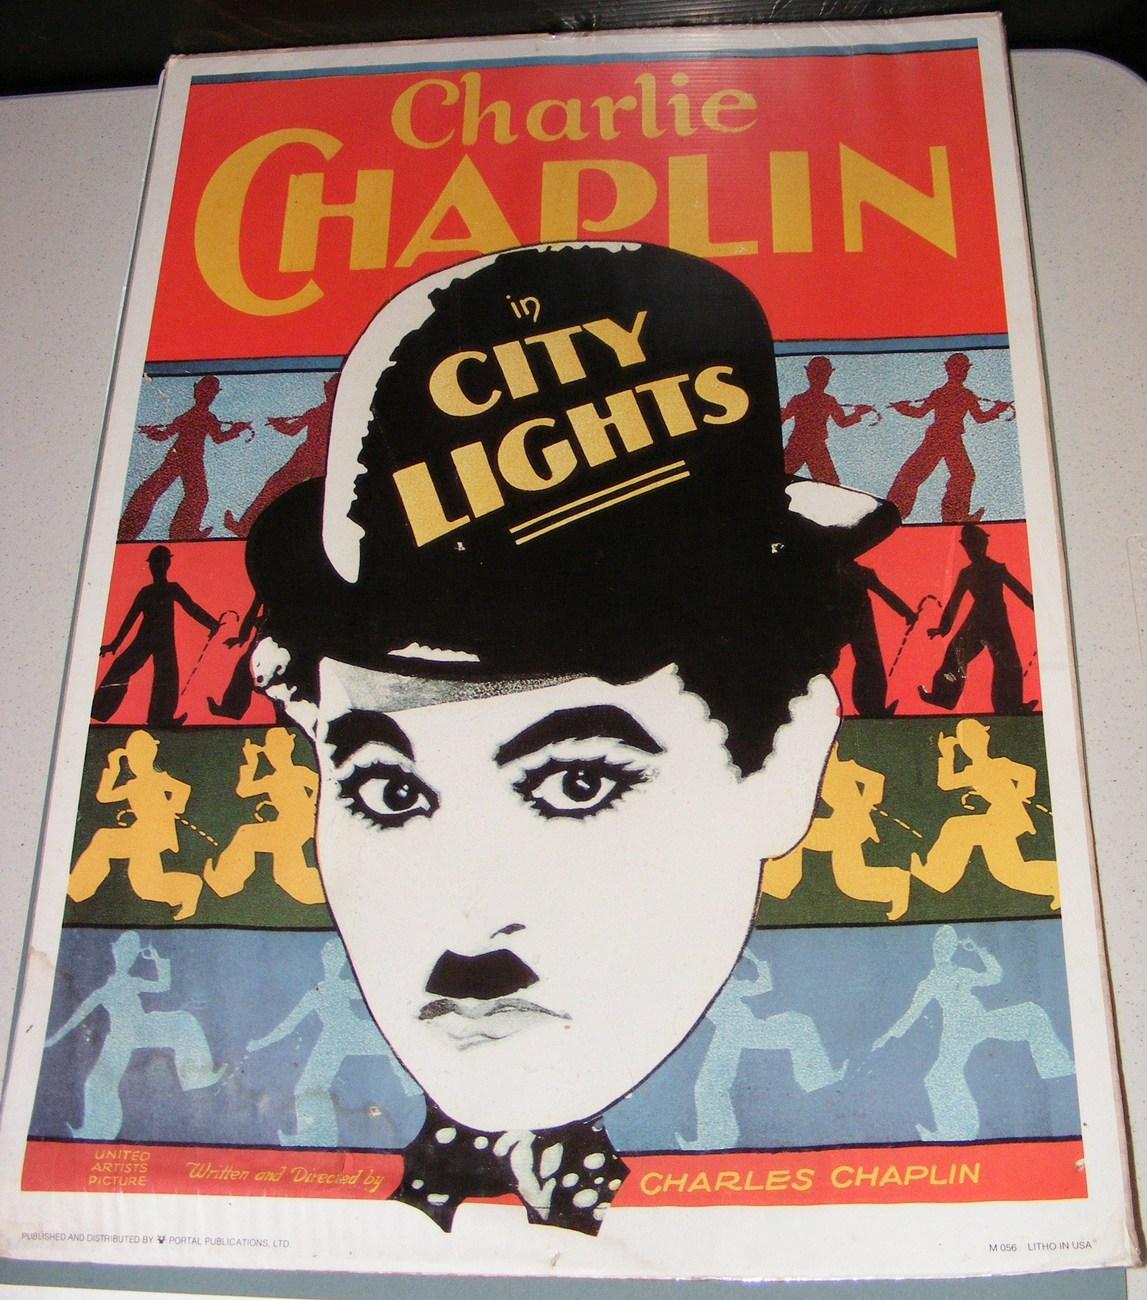 Charlie Chaplin Movie Poster - 1970-79